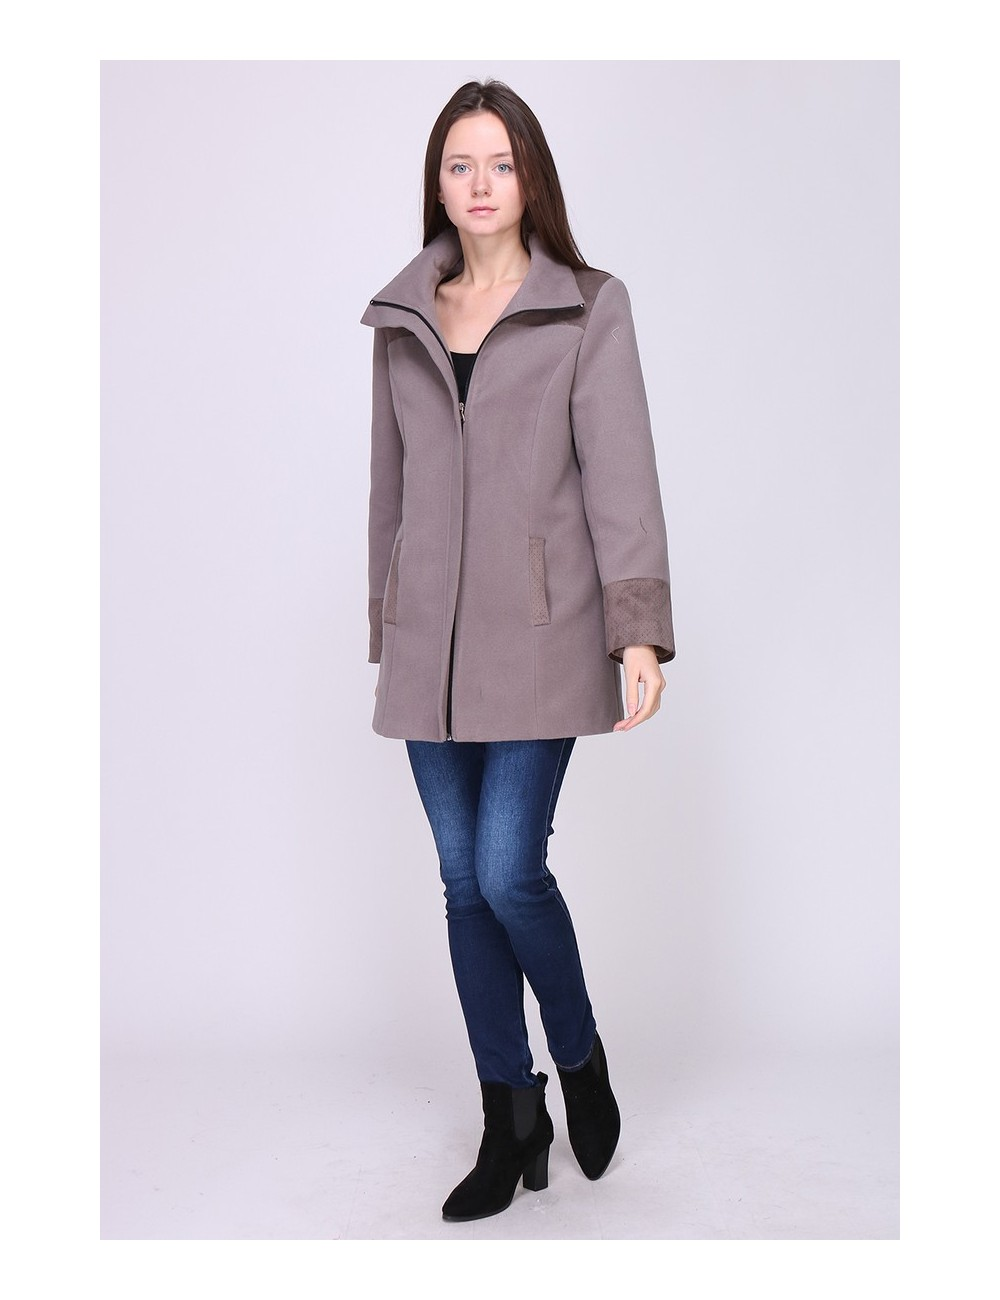 Manteau LAURA mi-long, coupe droite, col enveloppe. Taille 38 Couleur Taupe